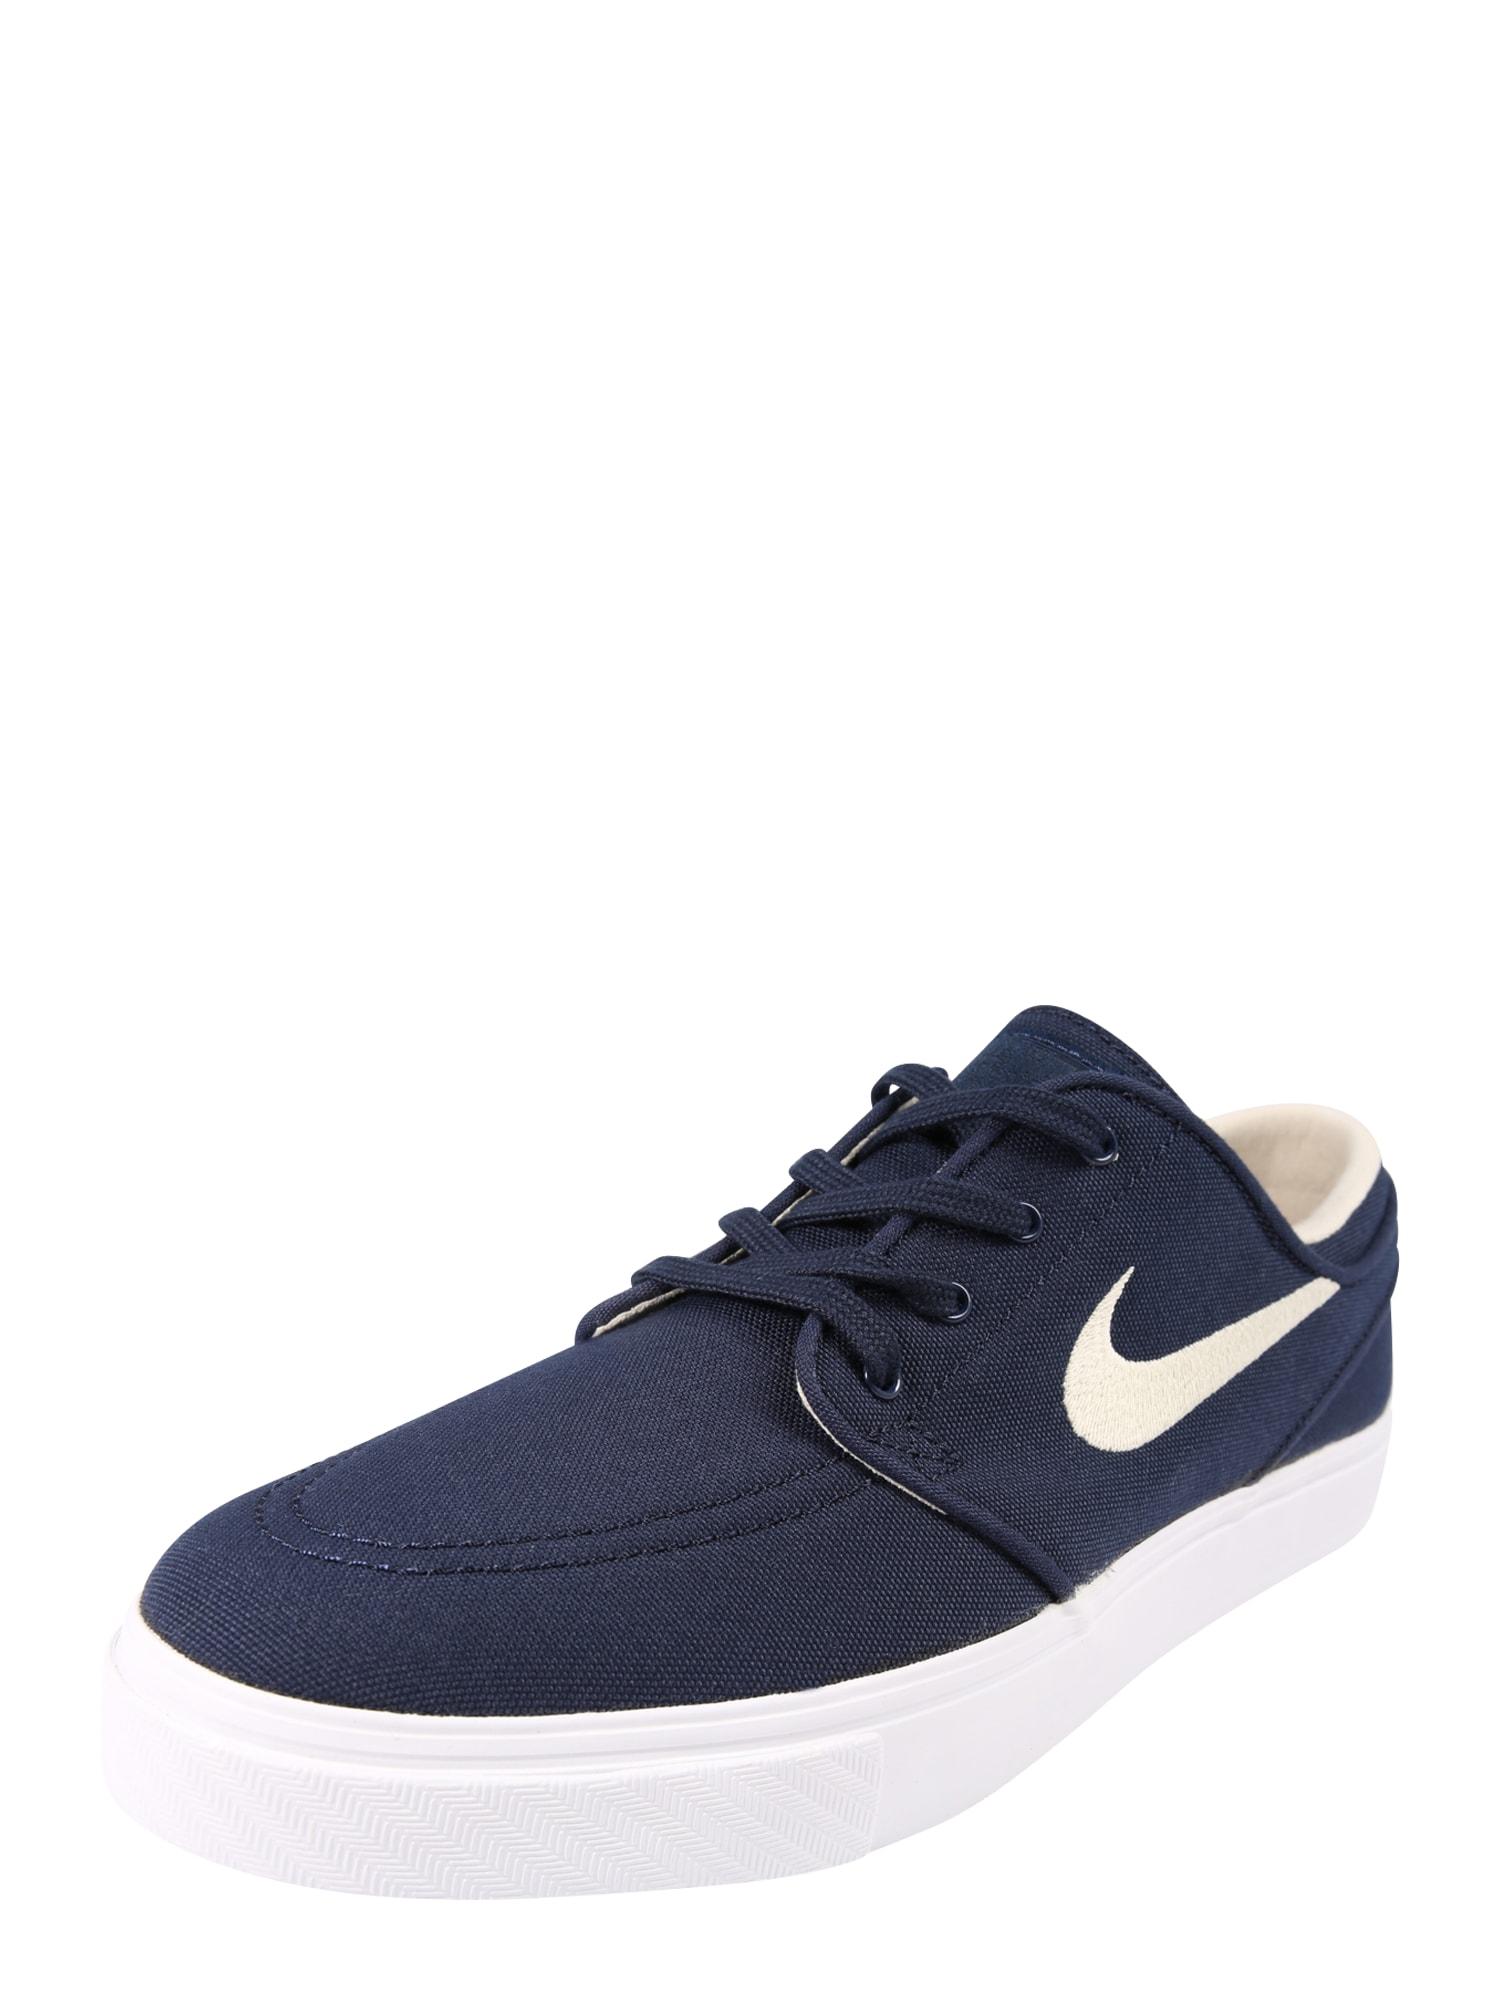 Nike SB Nízke tenisky 'Nike Air Zoom SB Stefan Janoski Canvas'  námornícka modrá